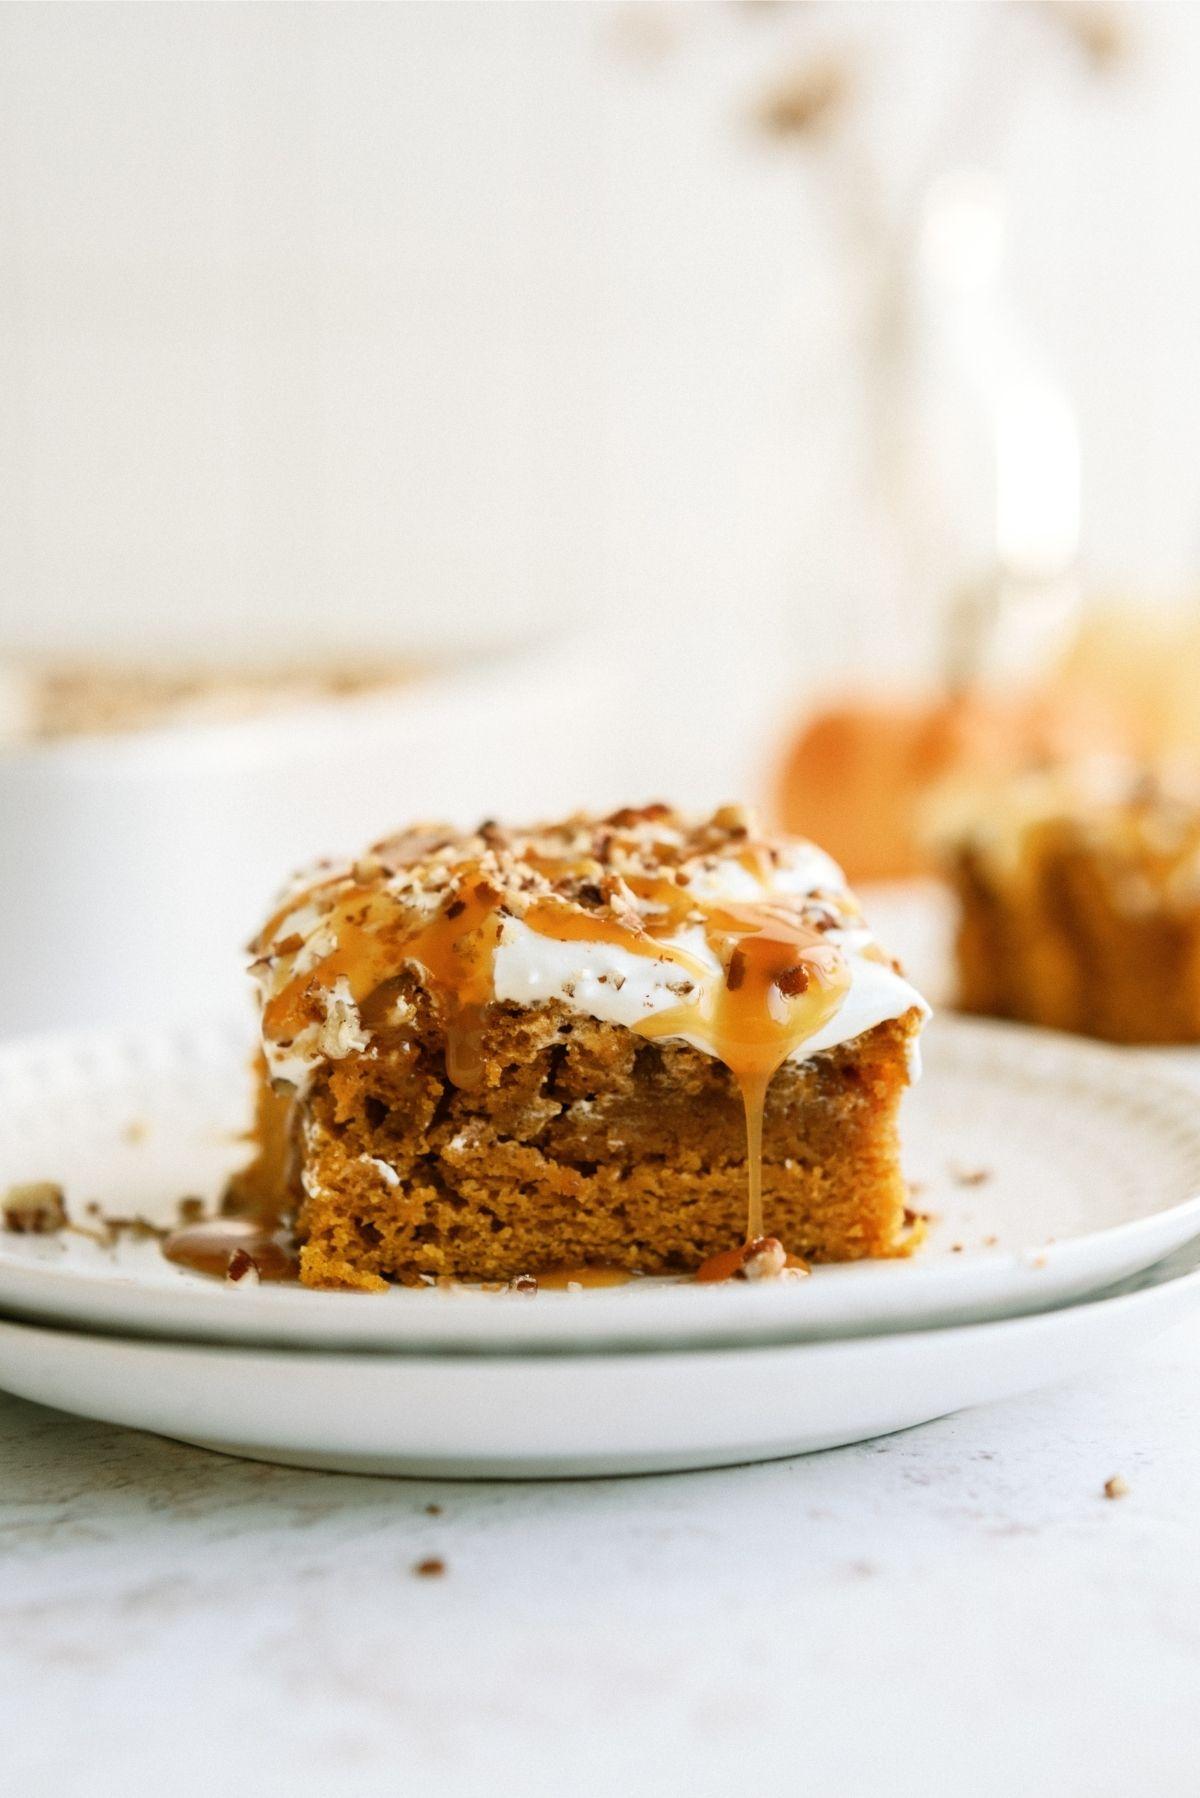 A slice of Caramel Pumpkin Poke Cake on a plate with cinnamon sticks